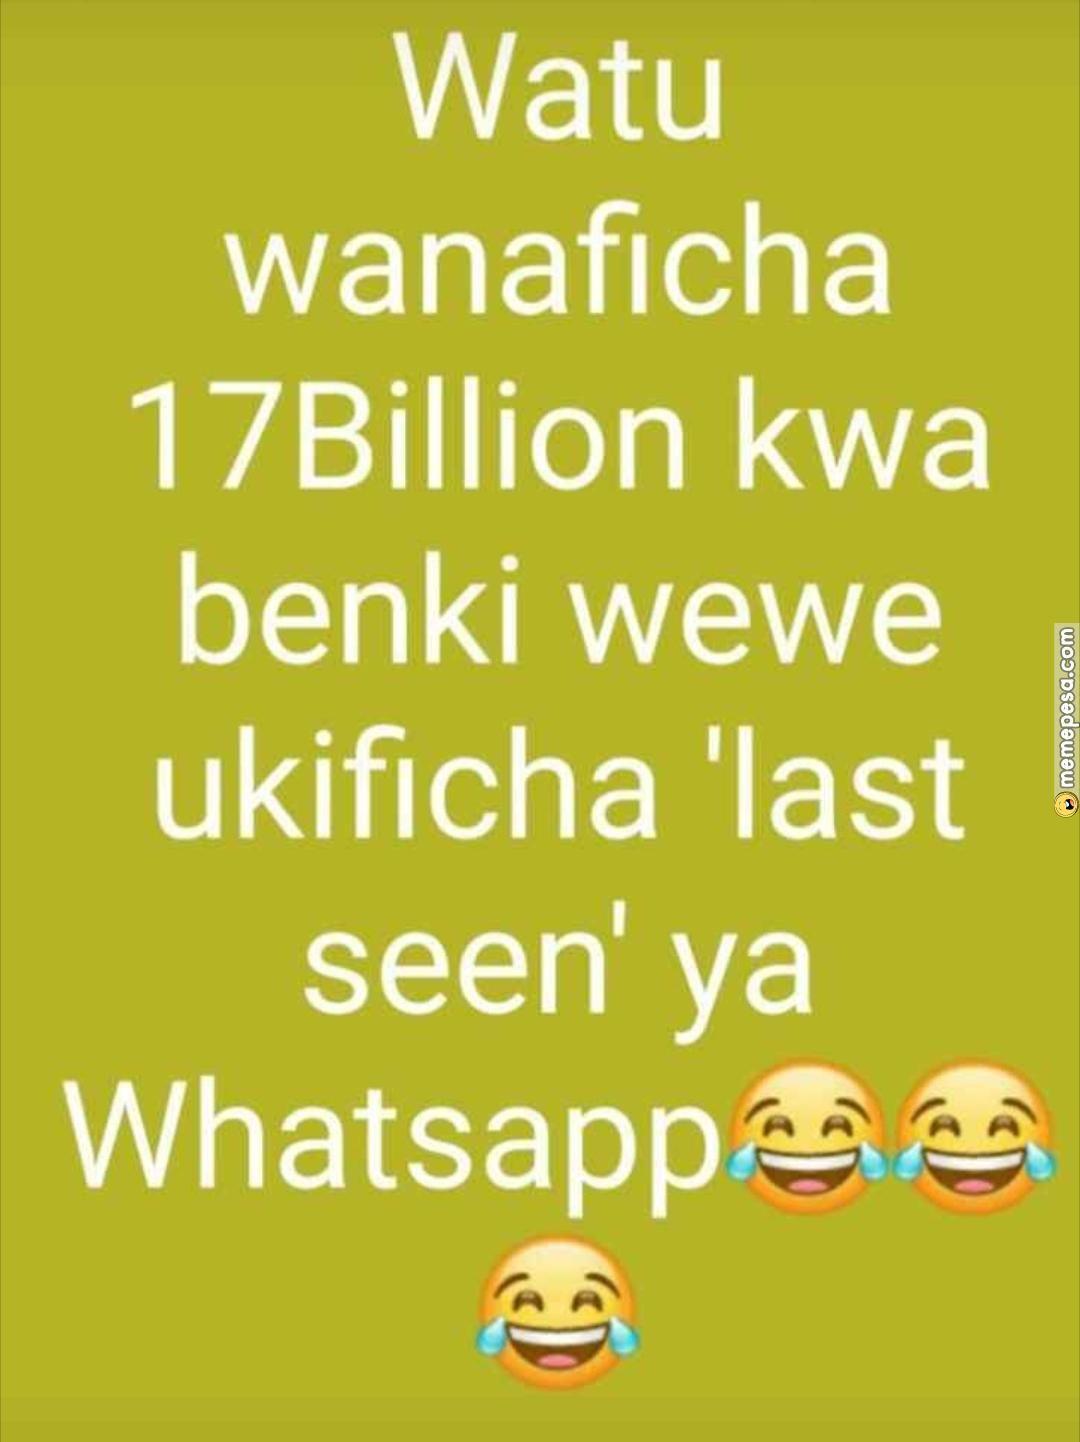 Memepesa Get Paid To Create Original Kenyan Memes Love Memes Funny Really Funny Memes Very Funny Jokes